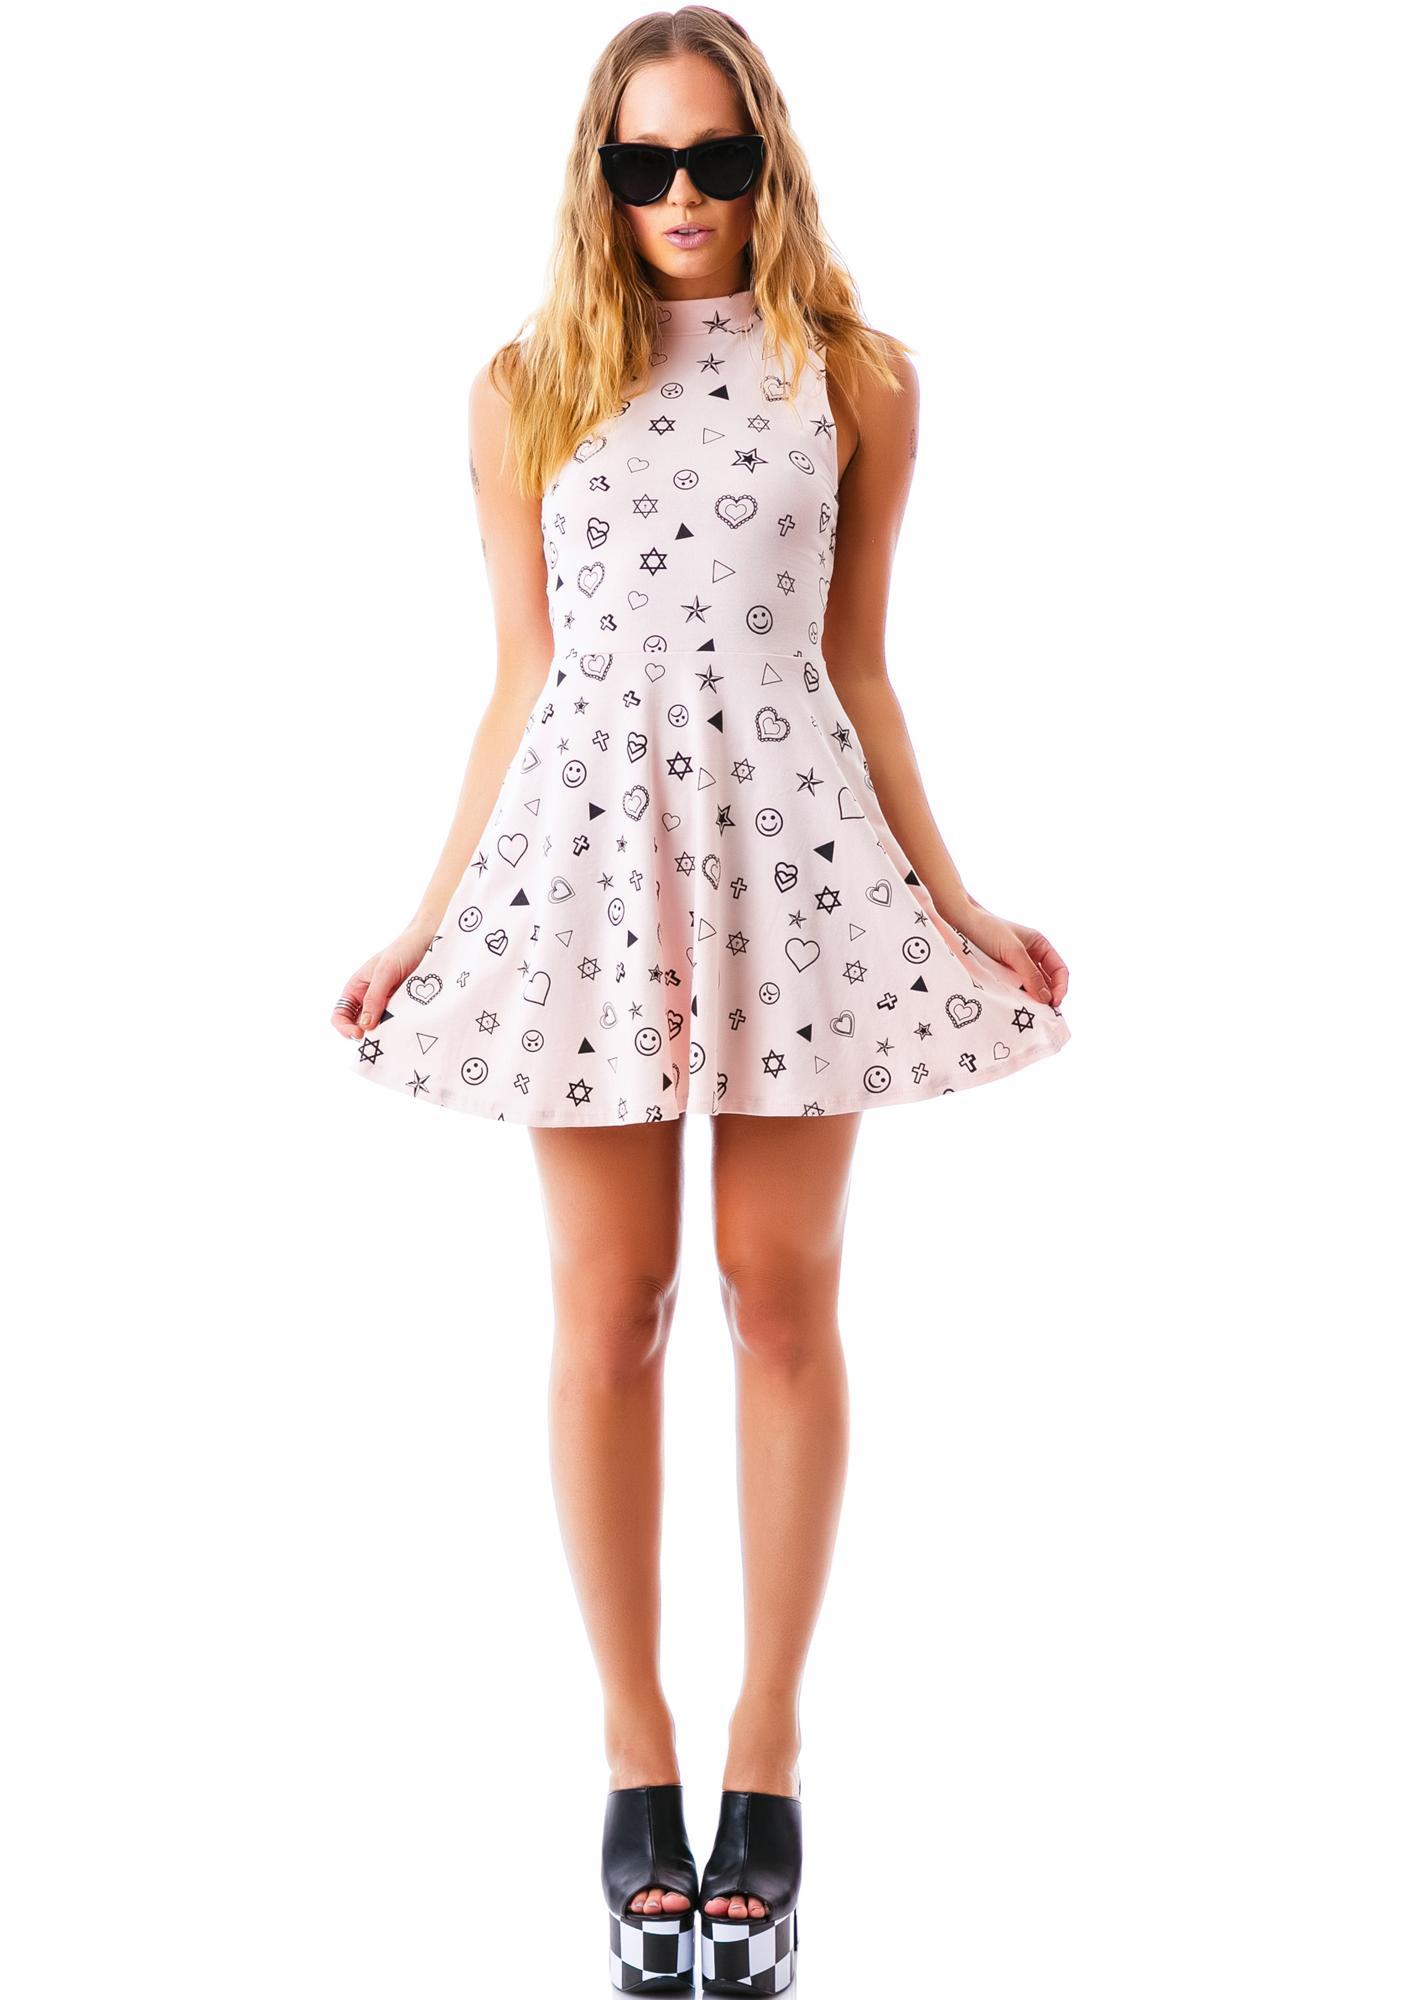 United Couture Basic Bitch Sugar Doll Dress